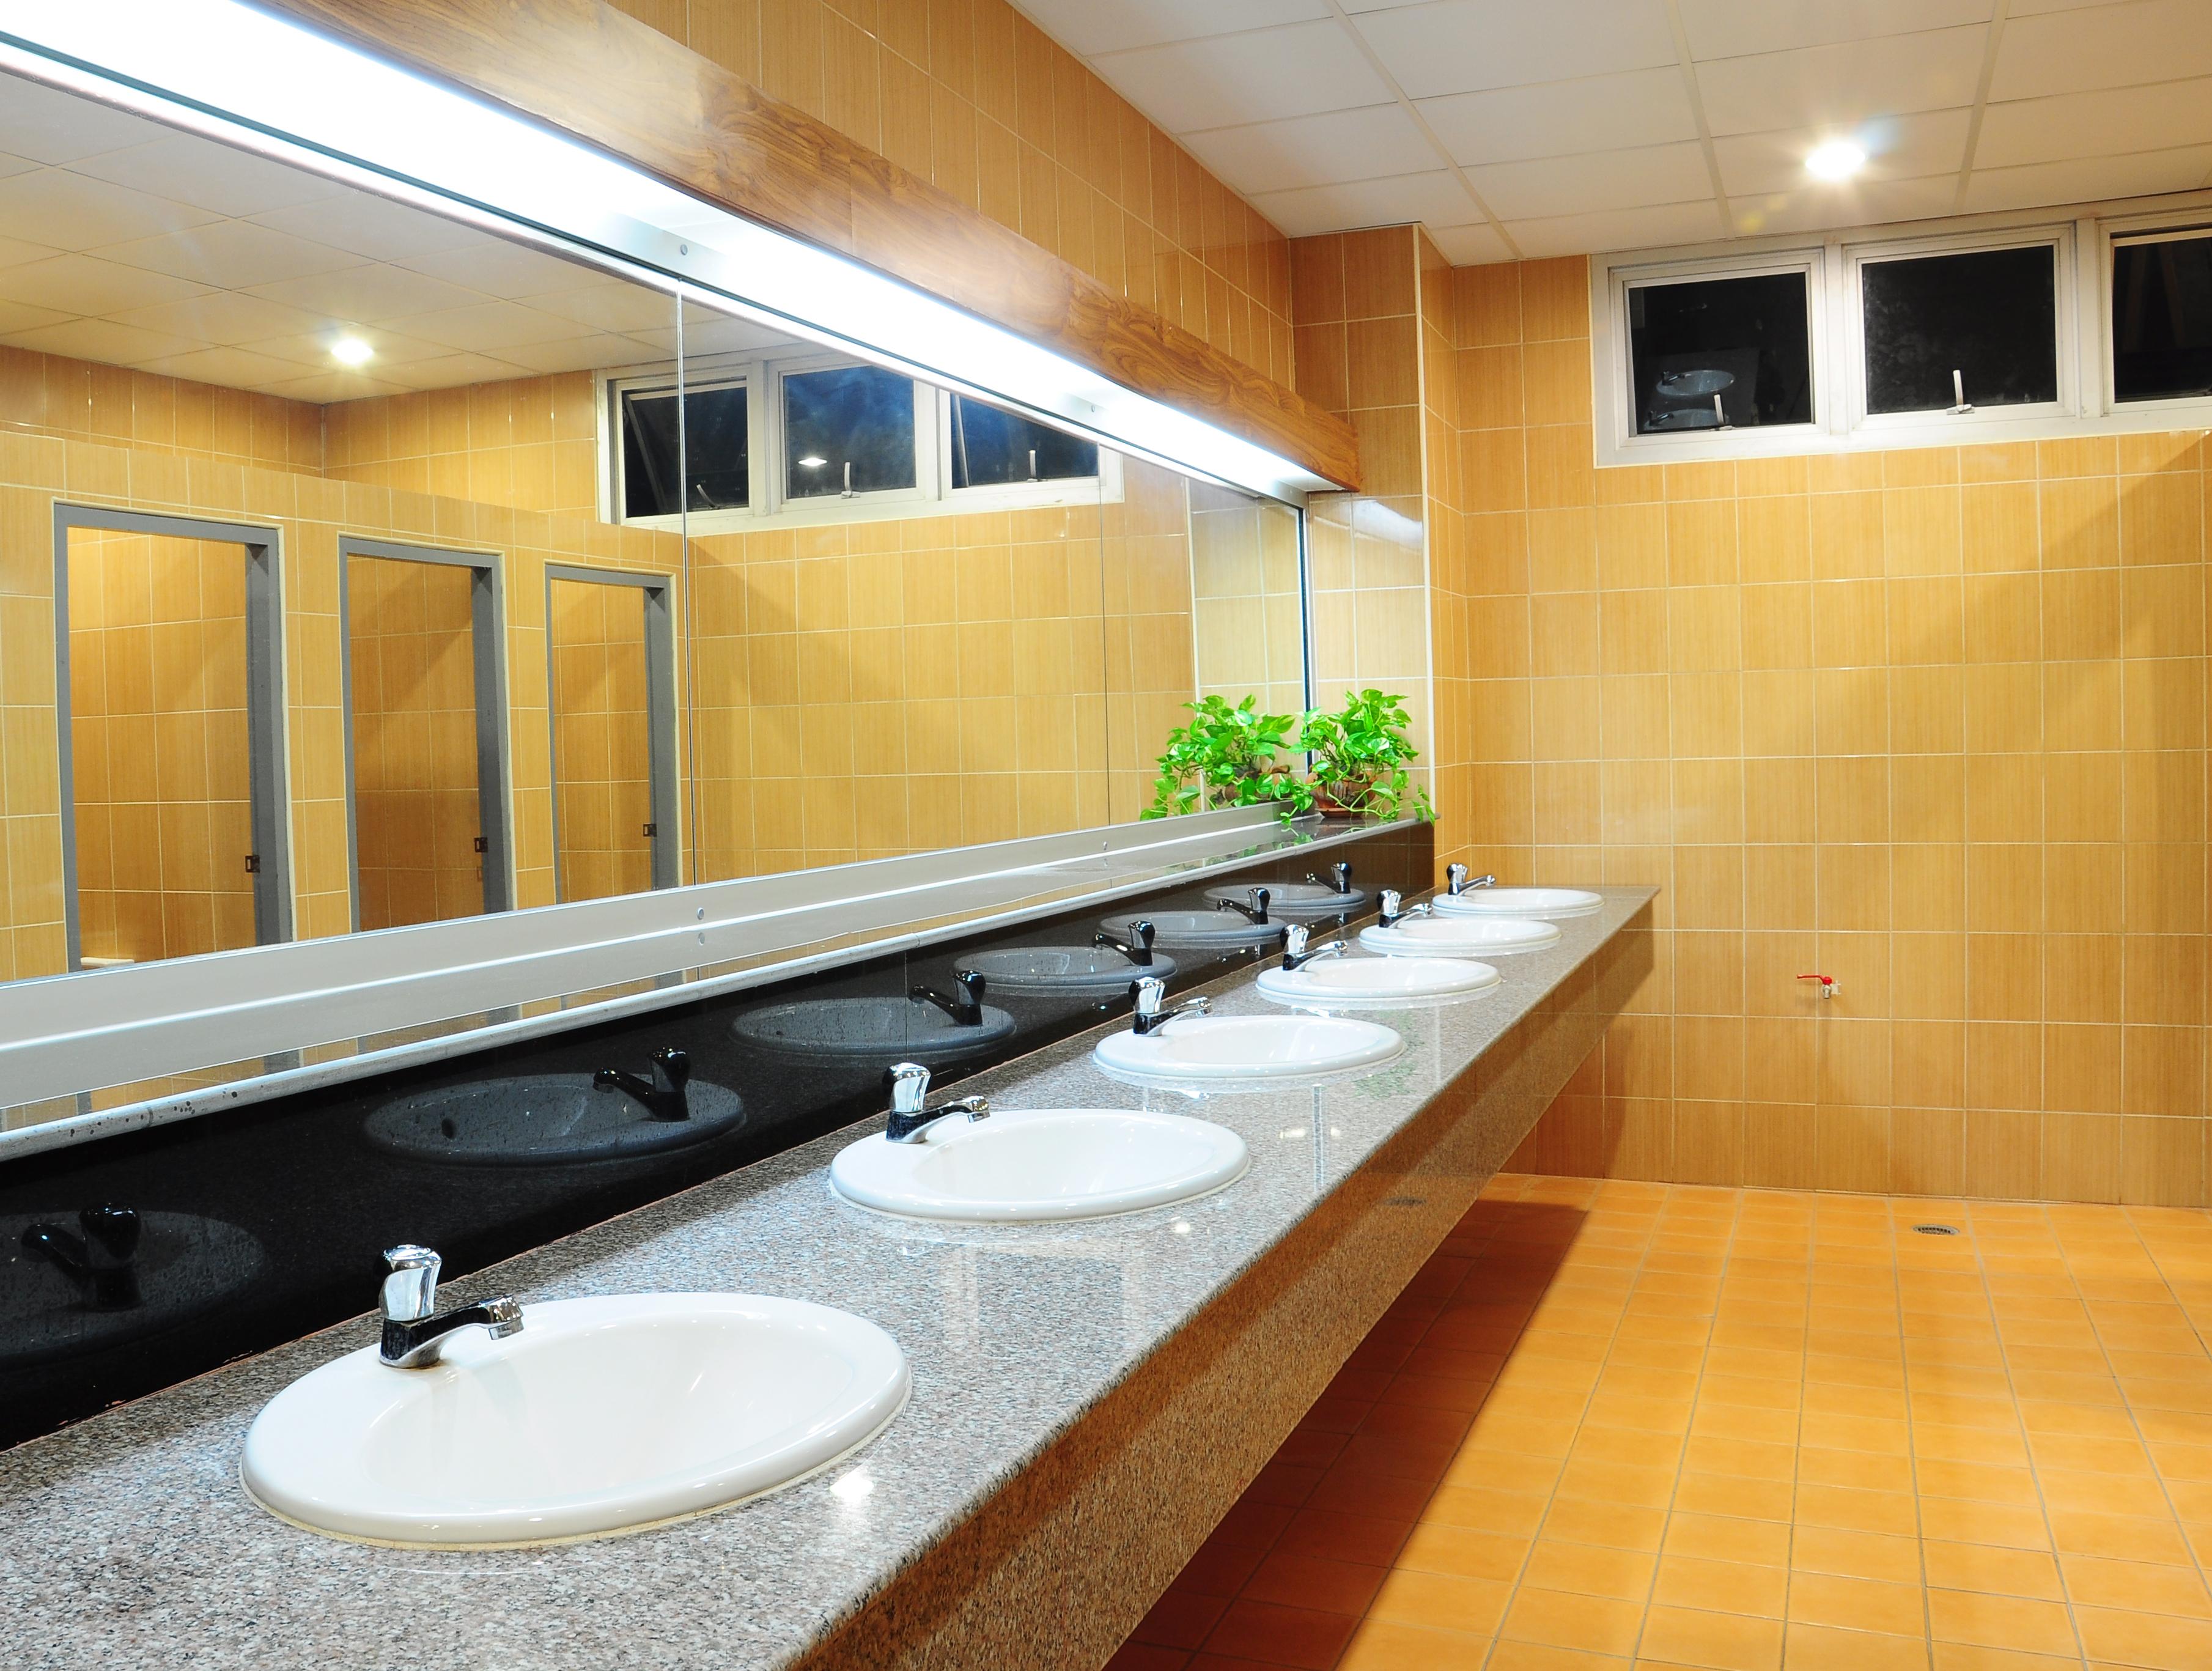 public bathroom plumbing